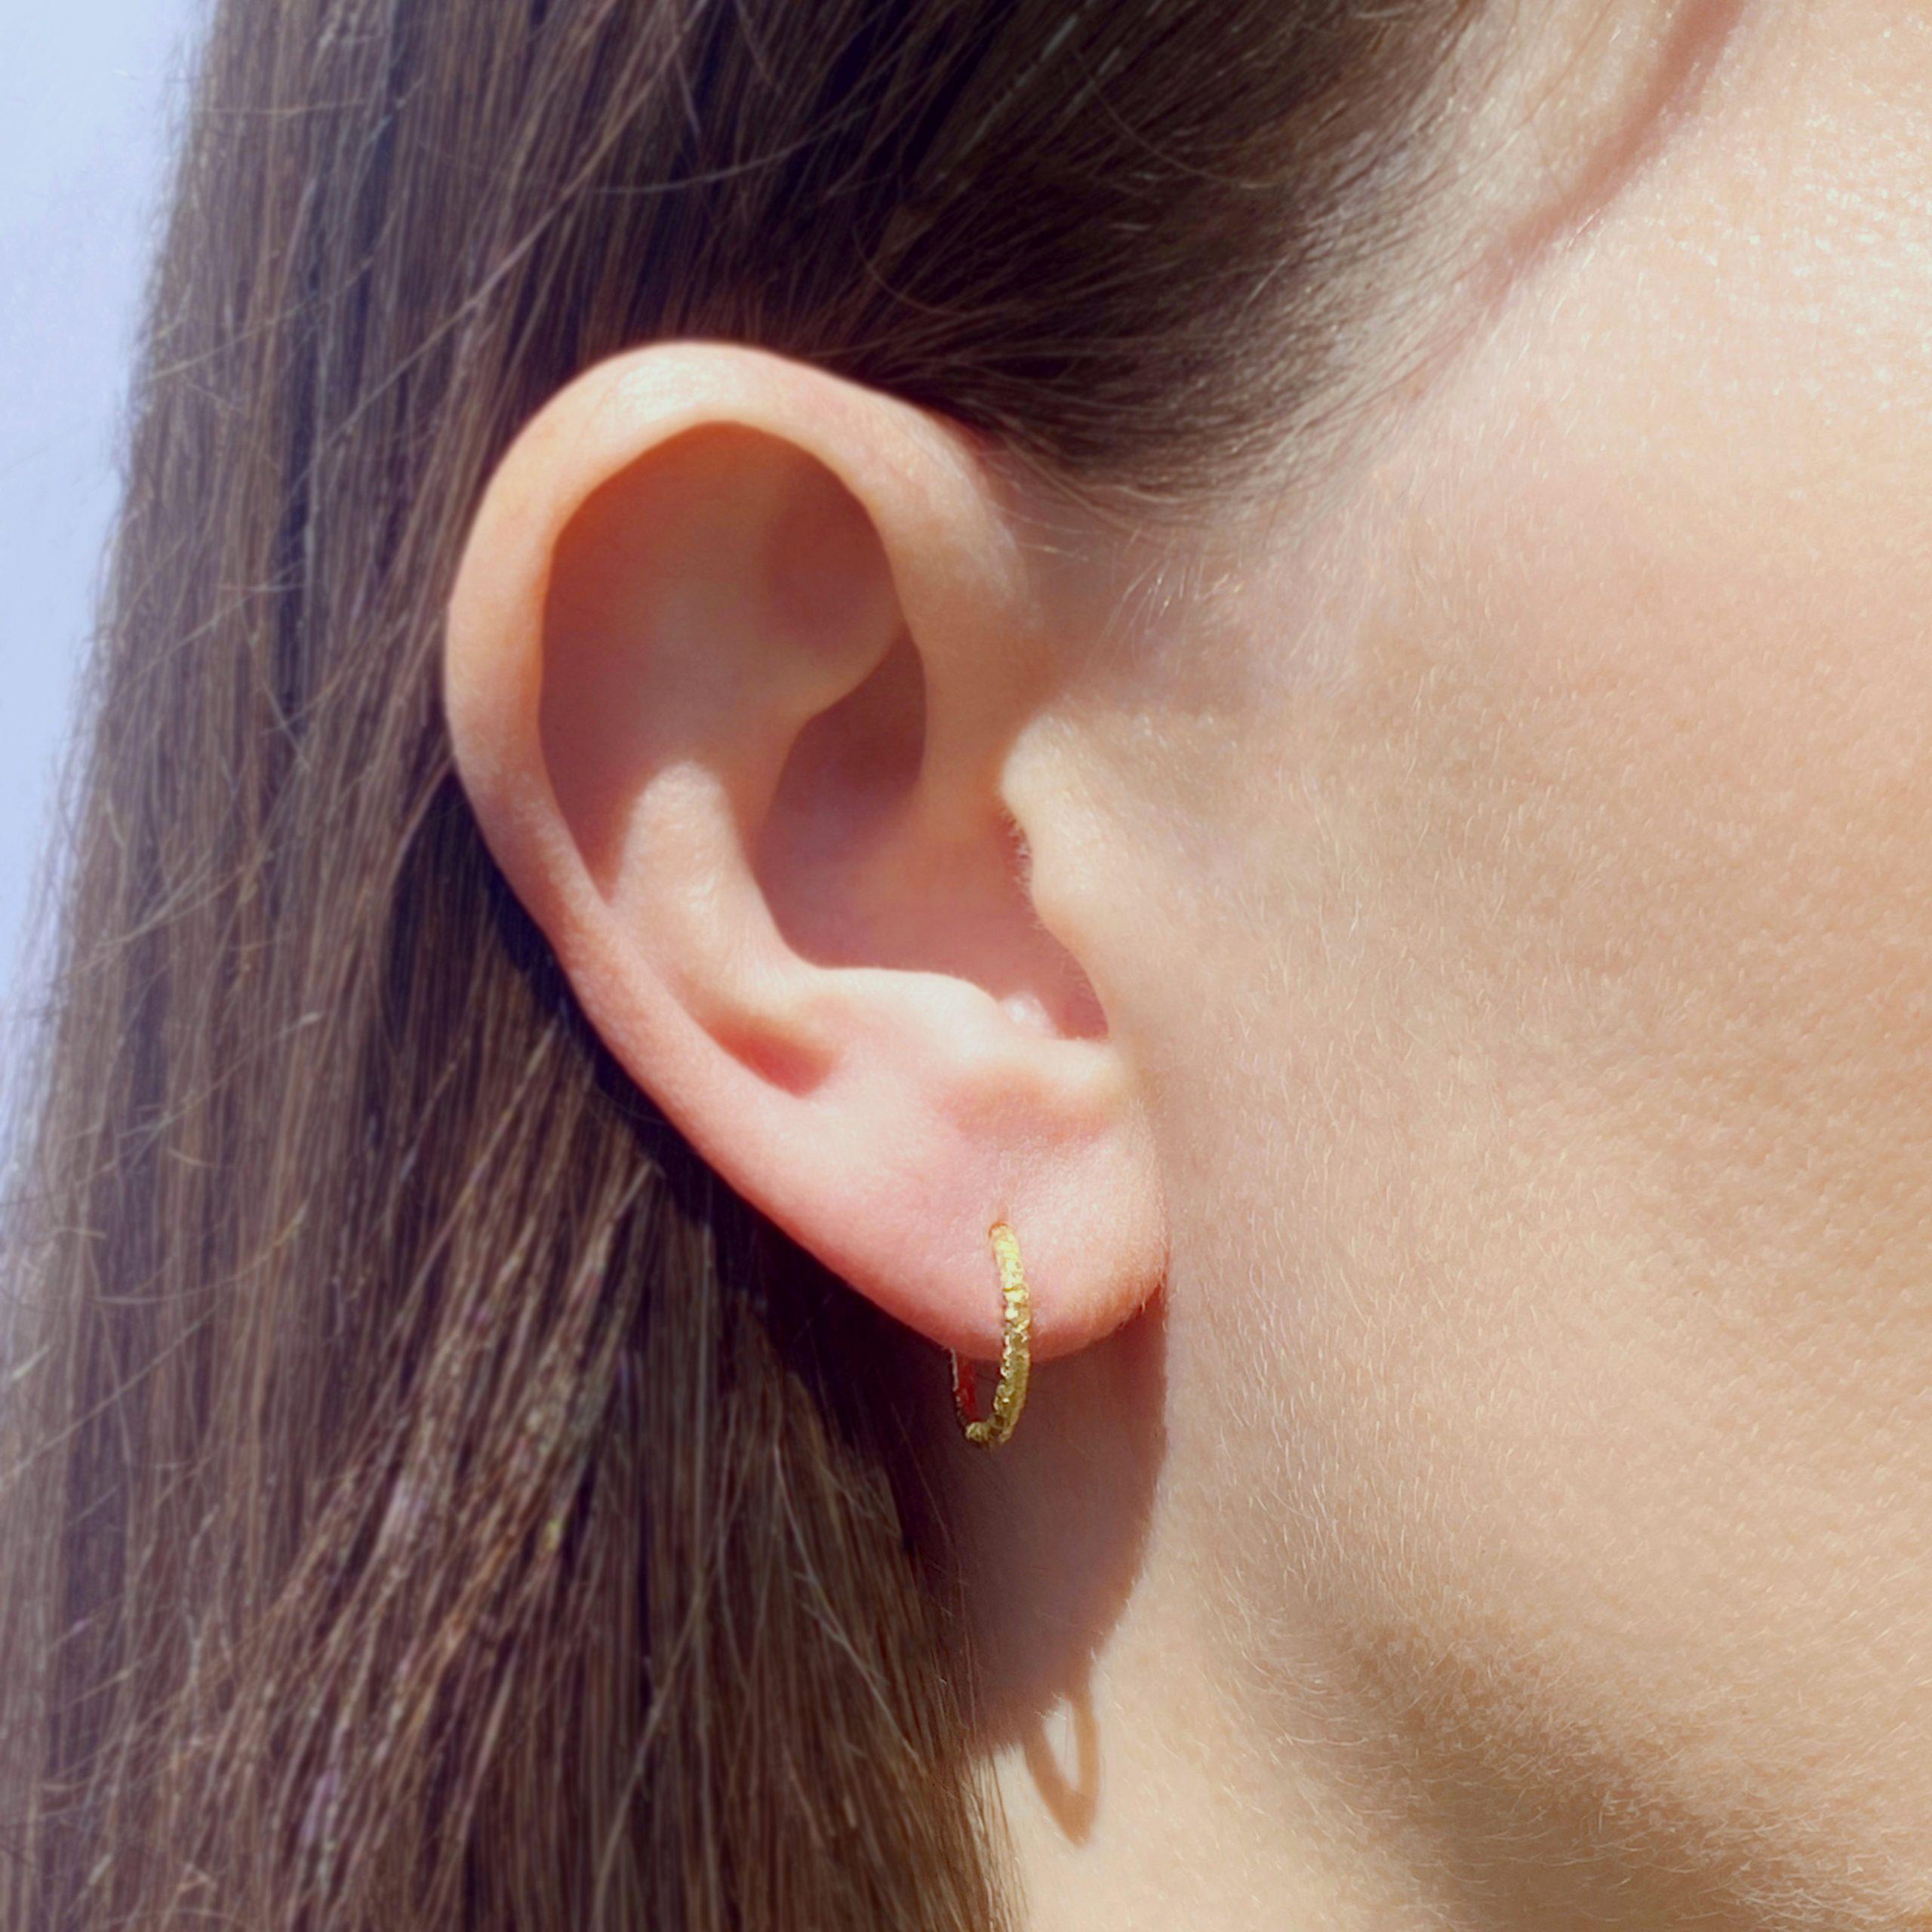 Gaia Textured 18ct Yellow Gold Hoop Earrings 10mm